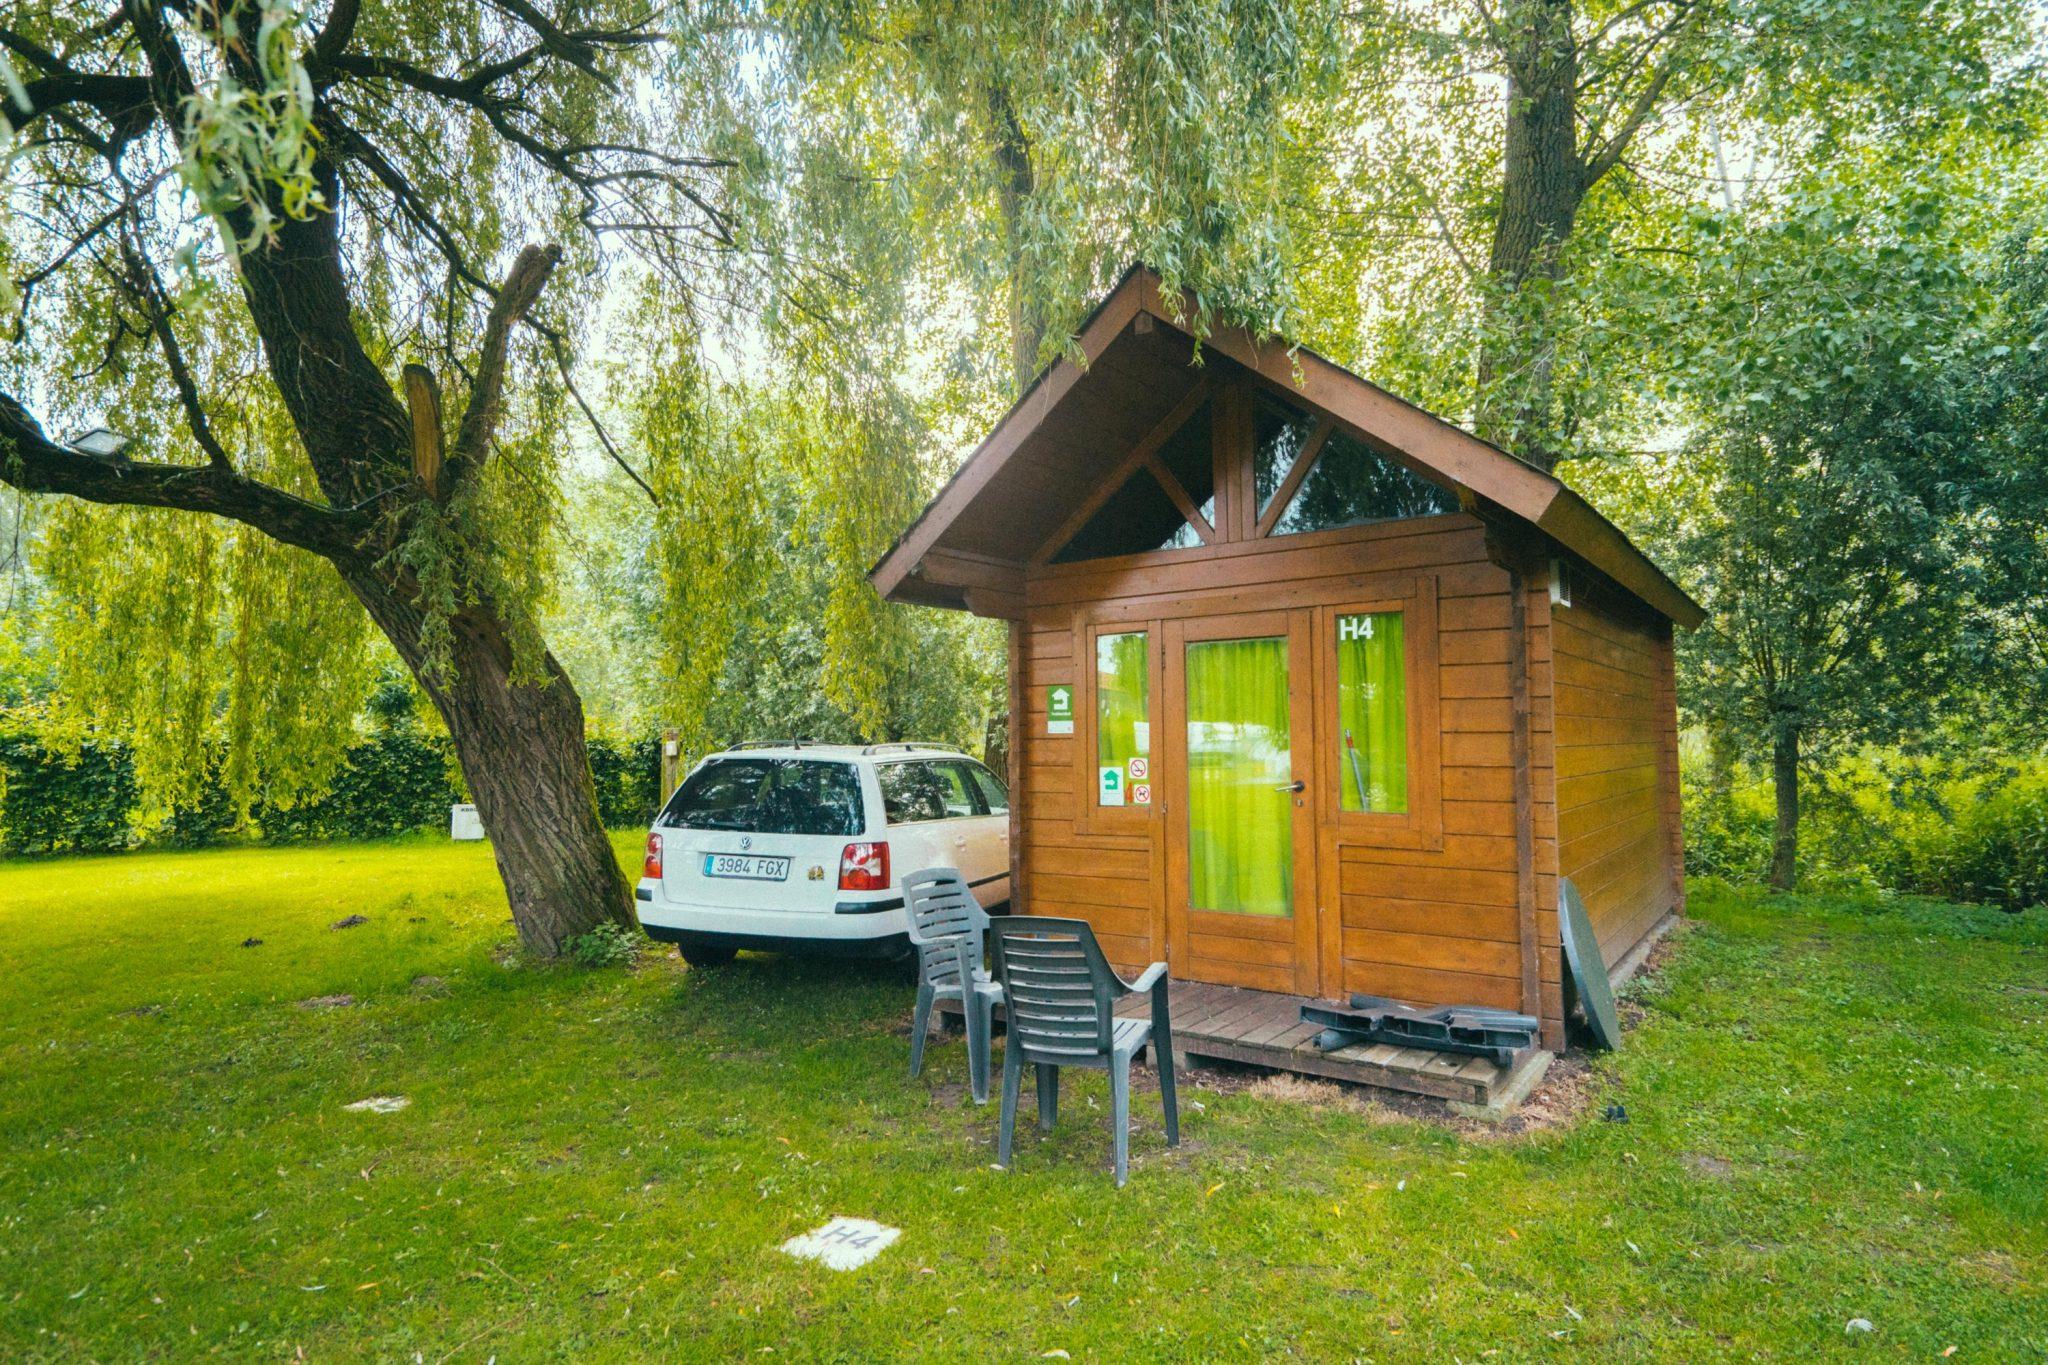 Camping Groeneveld - Verblijf in trekkershut met auto parking